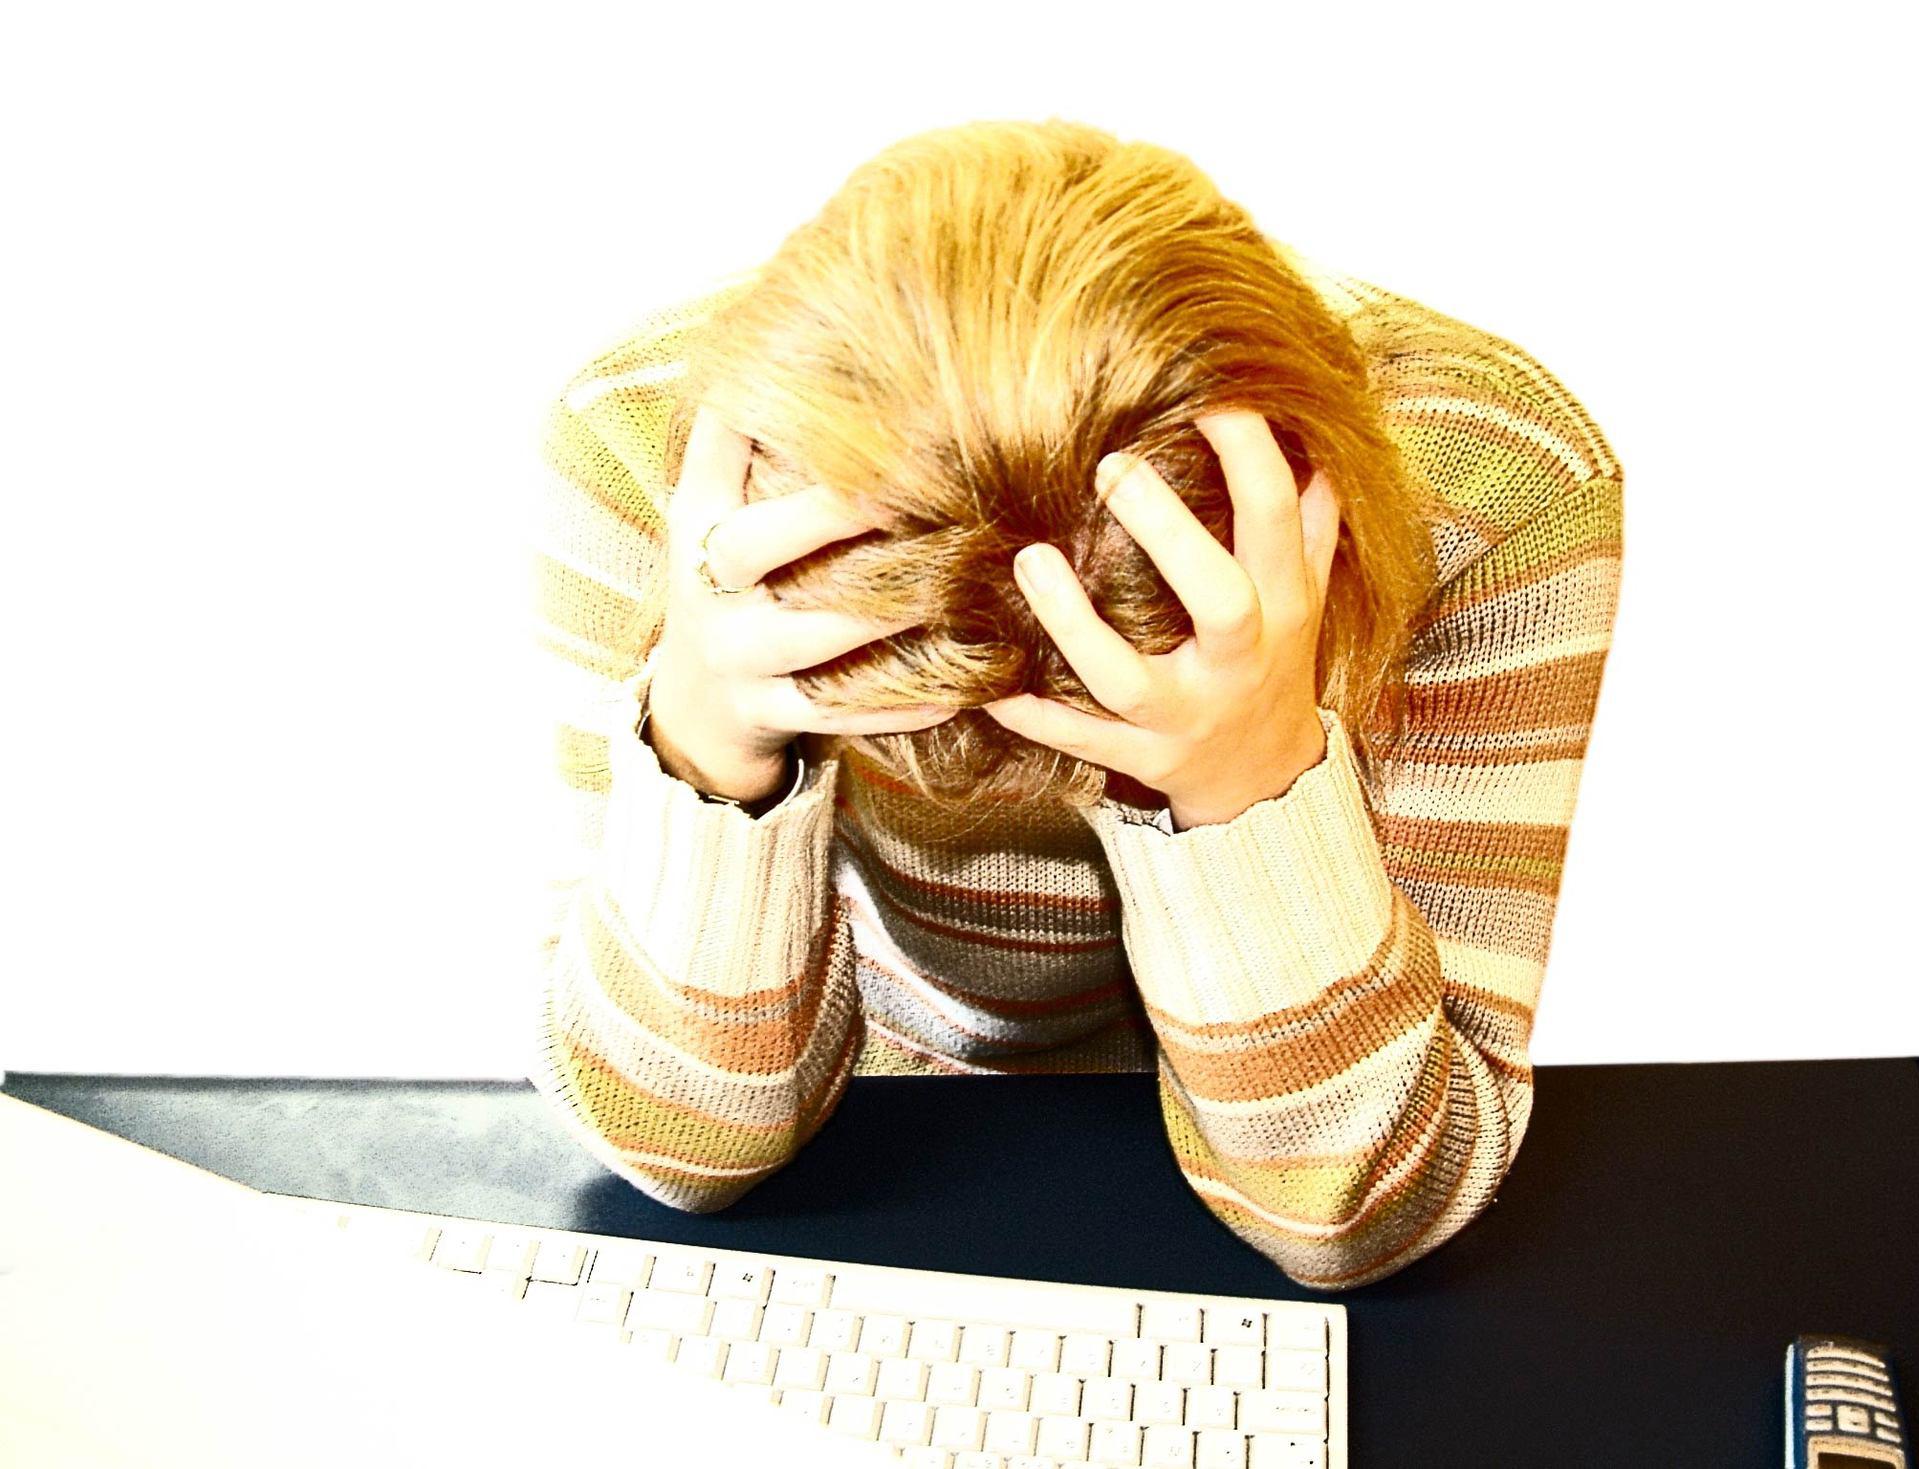 despair-work-falure-computer-1494555-1919x1468